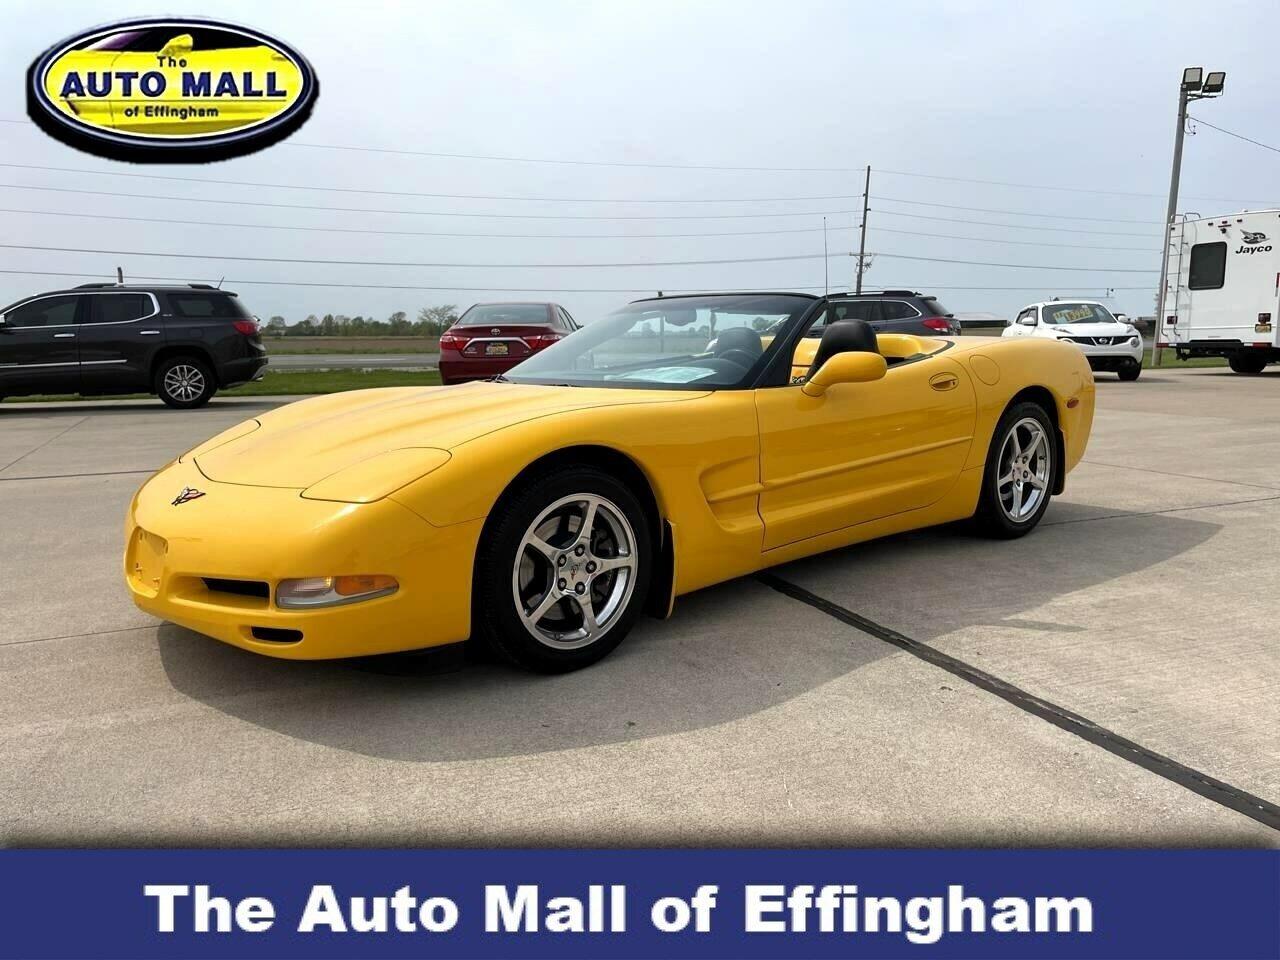 2004 Yellow Chevrolet Corvette Convertible    C5 Corvette Photo 1